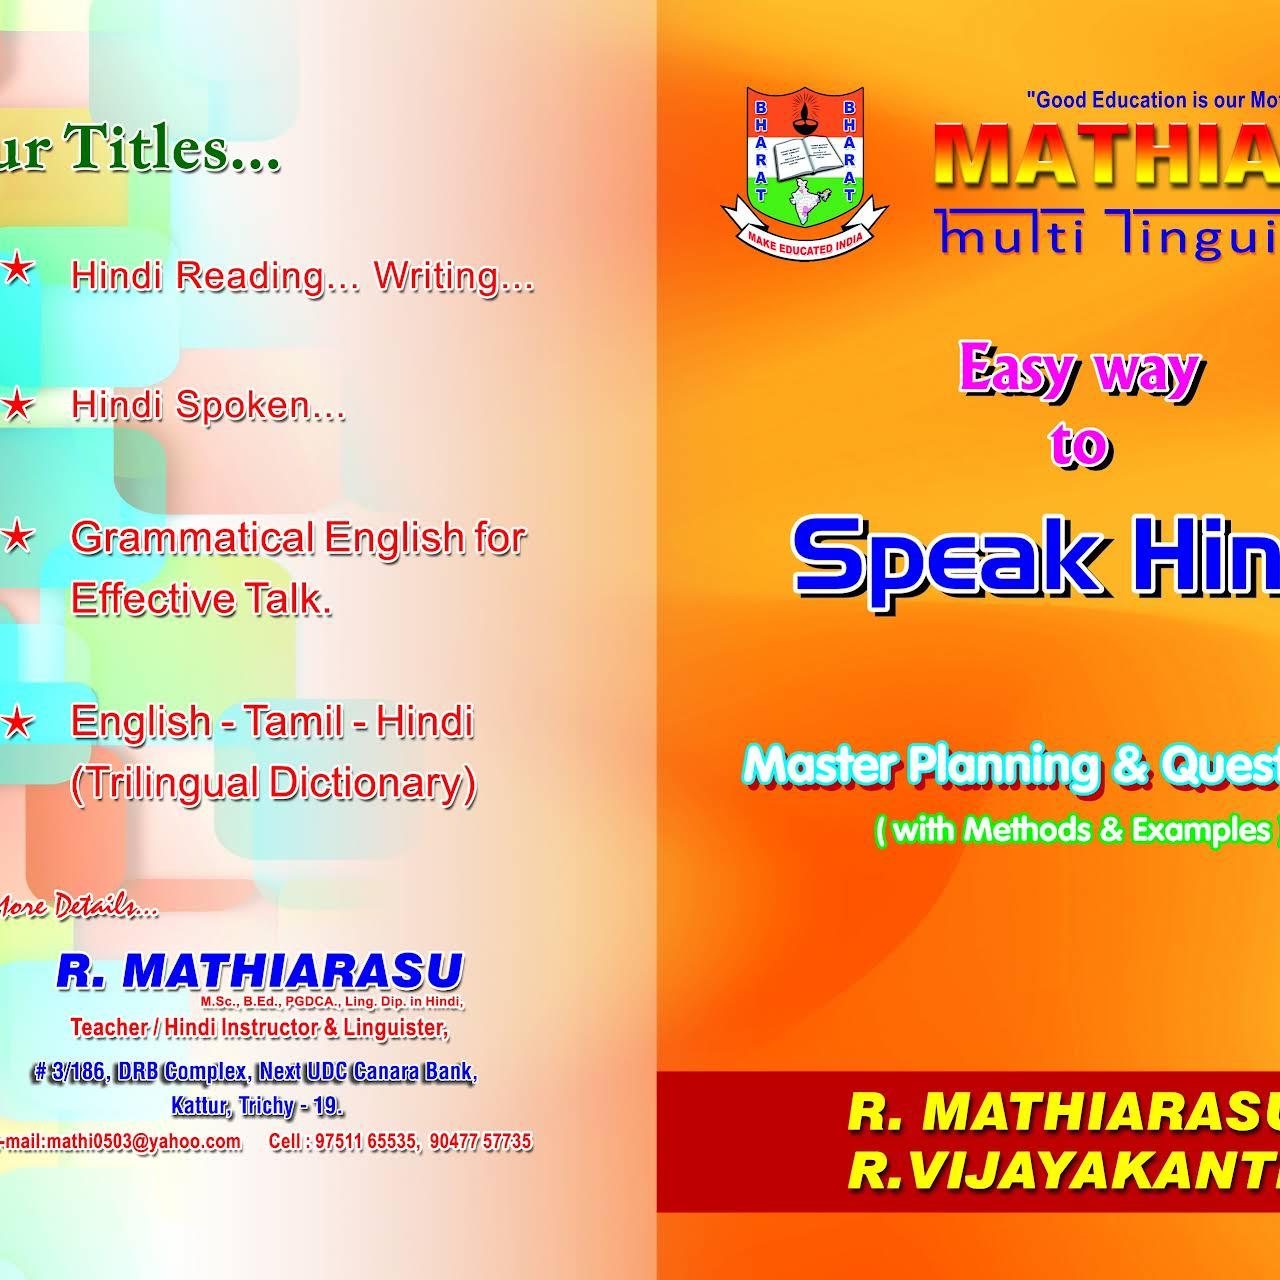 Mathiars Spoken Hindi Books - Book Publisher in Orathanadu